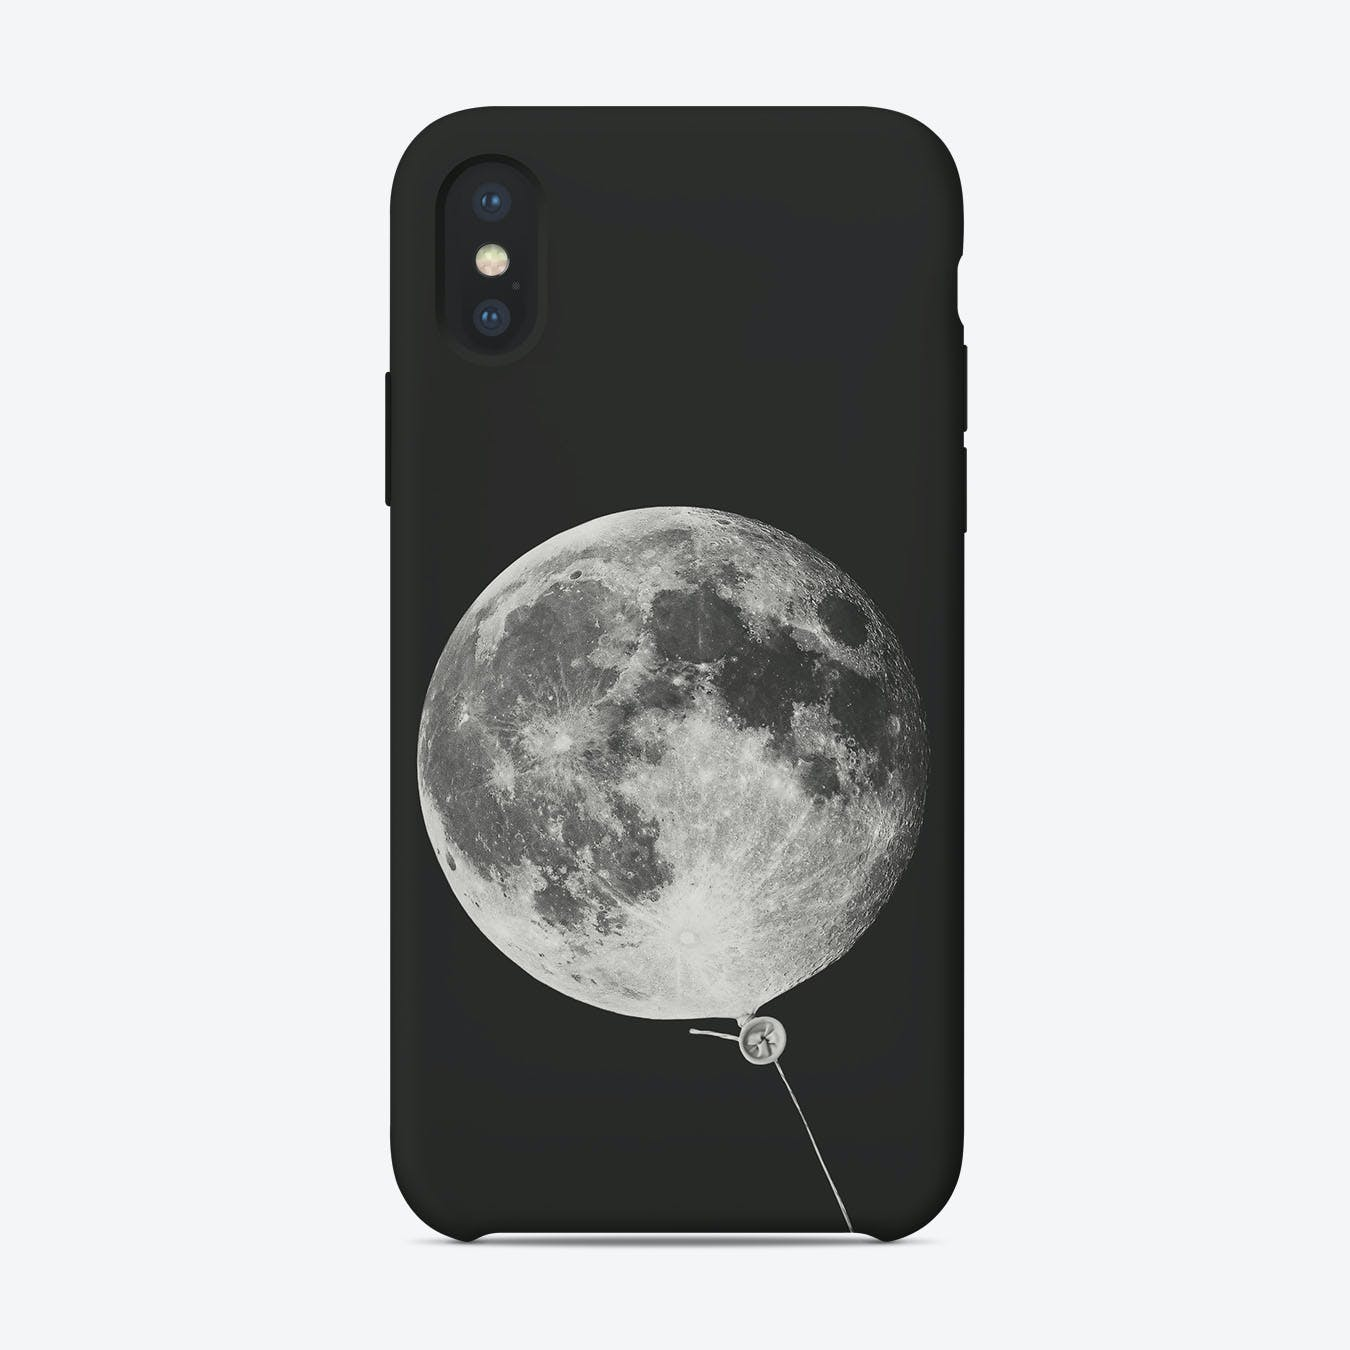 Moon Balloon Space iPhone Case